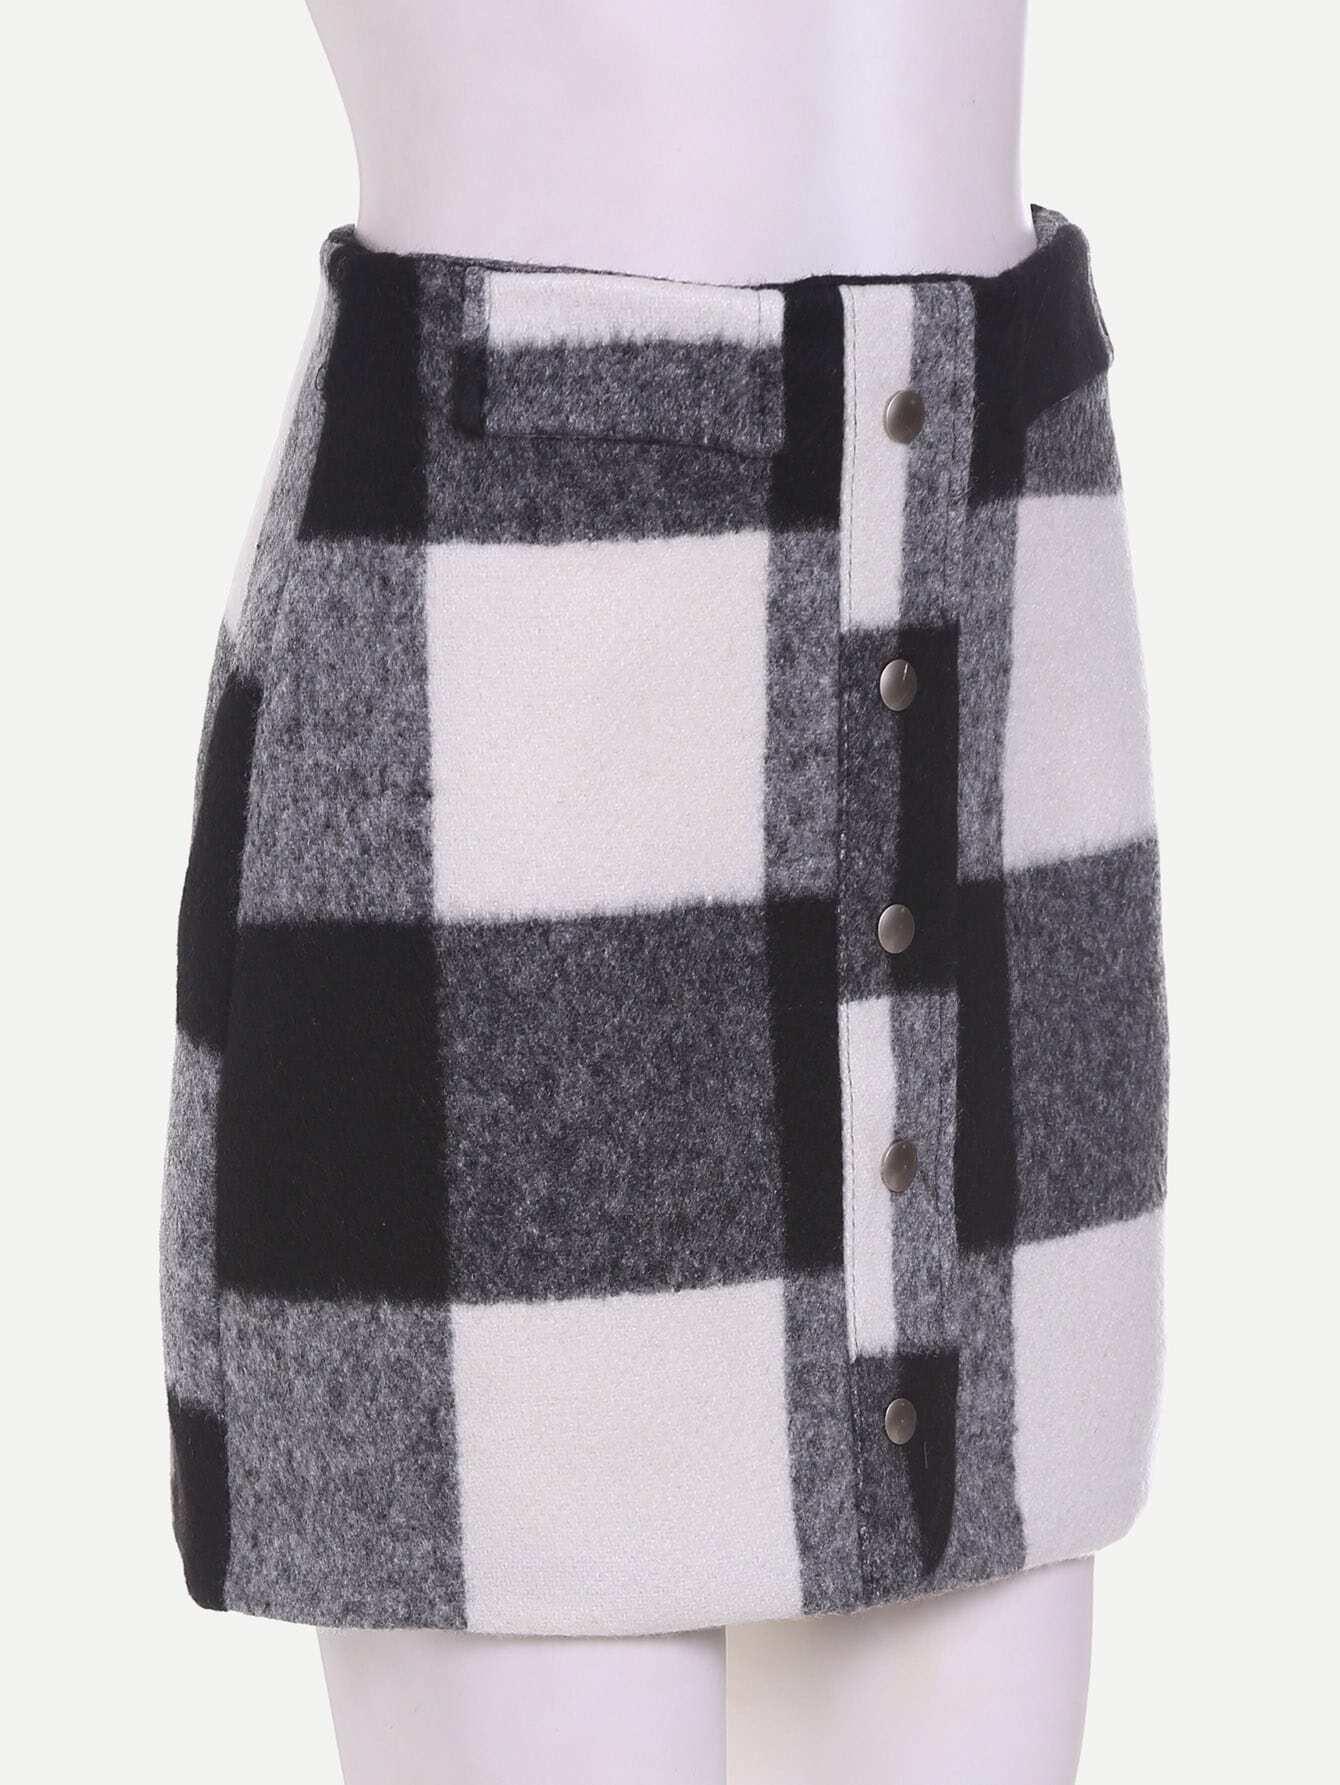 jupe moulant cossais seul boutonnage avec zipp french romwe. Black Bedroom Furniture Sets. Home Design Ideas